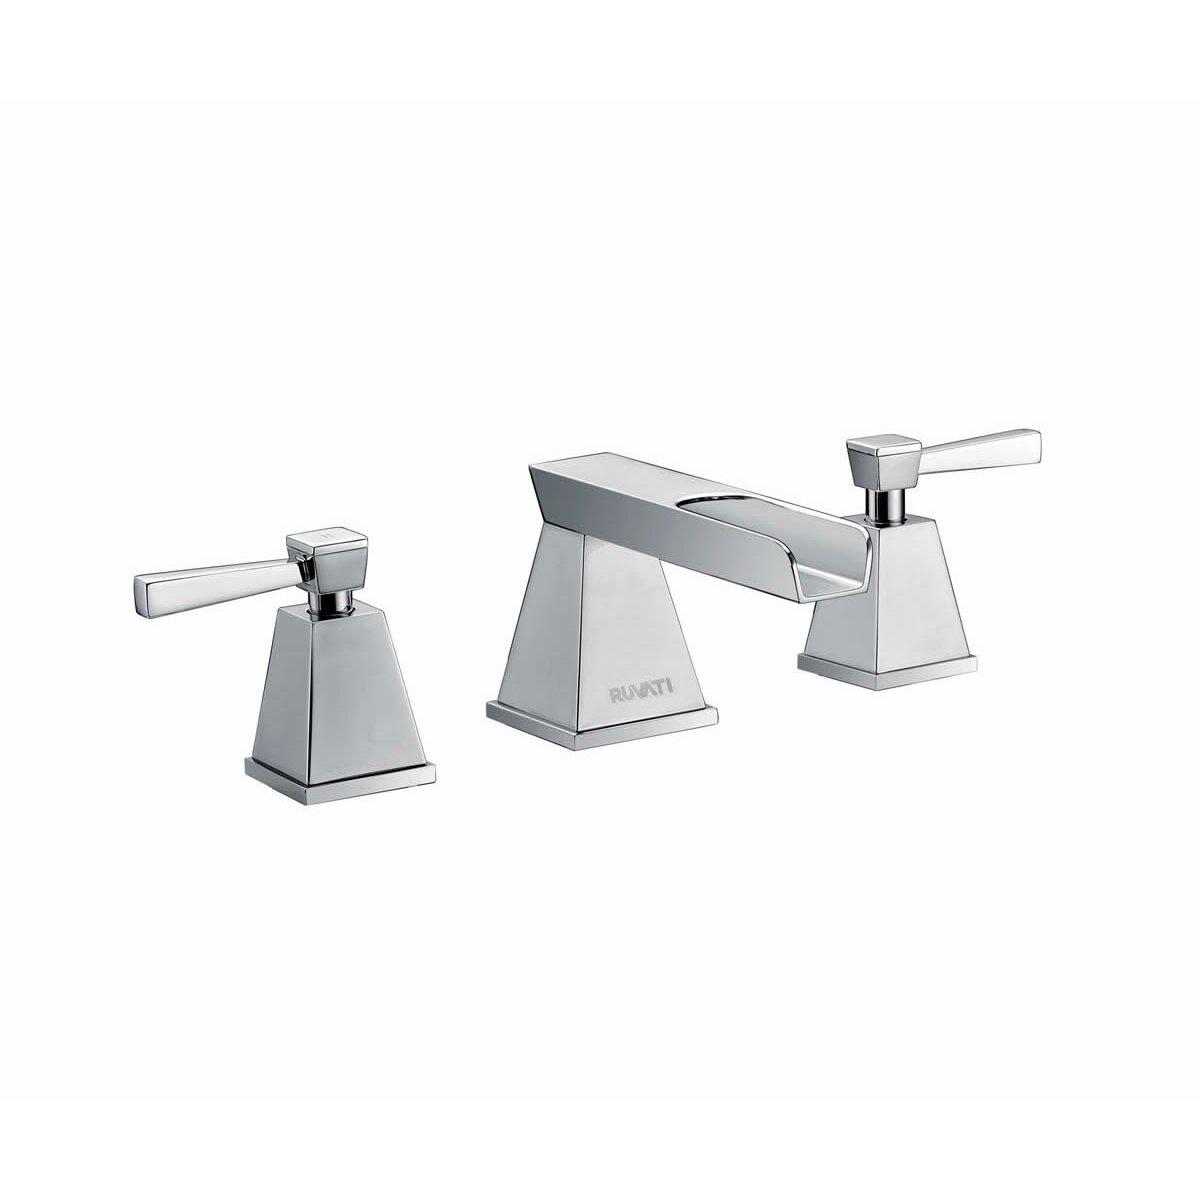 Ruvati Waterfall Double Handle Widespread Bathroom Faucet Reviews Wayfair